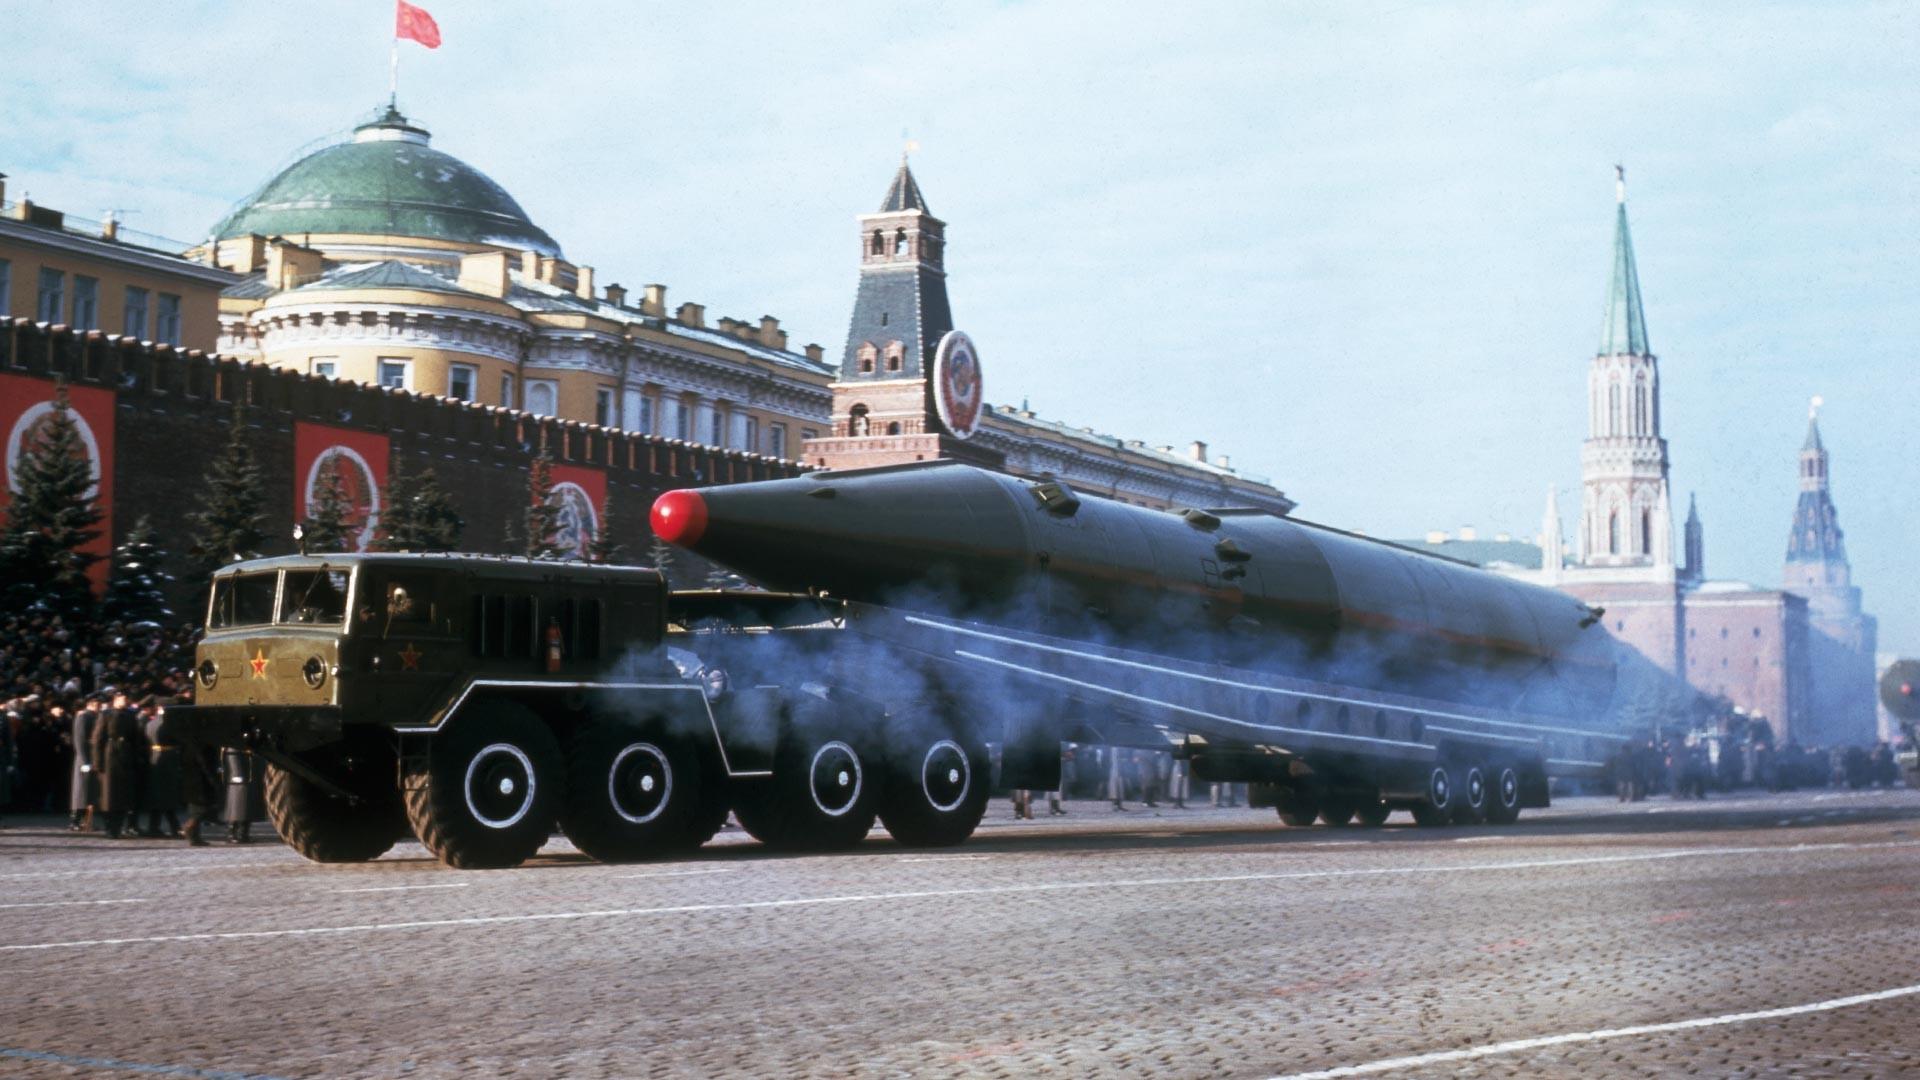 Sovjetska balistička raketa ispred Kremlja na paradi povodom 50. godišnjice Oktobarske revolucije.